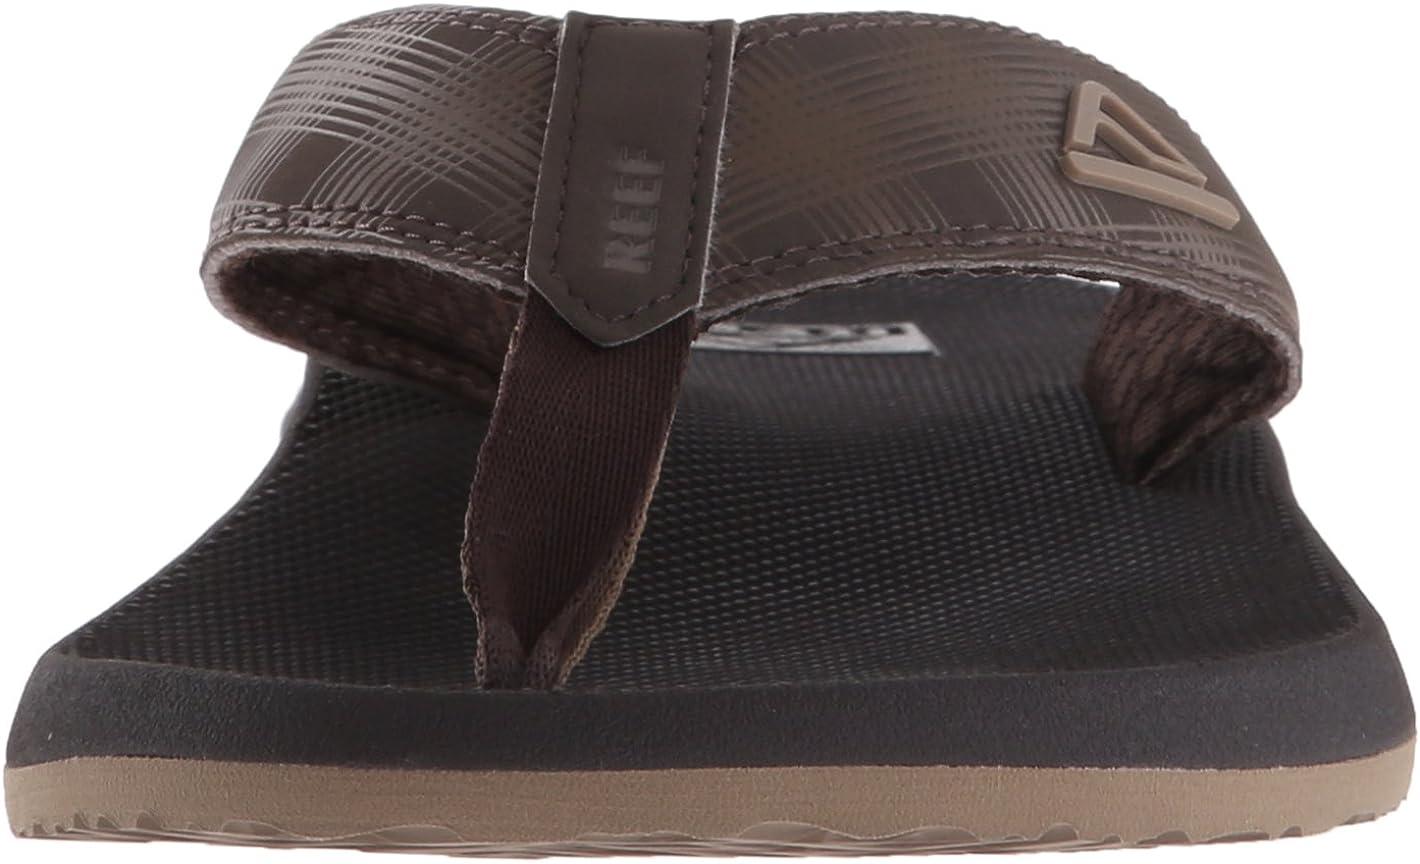 Reef Mens Sandals Phantom | Athletic Flip Flops For Men With Contoured Footbed | Waterproof